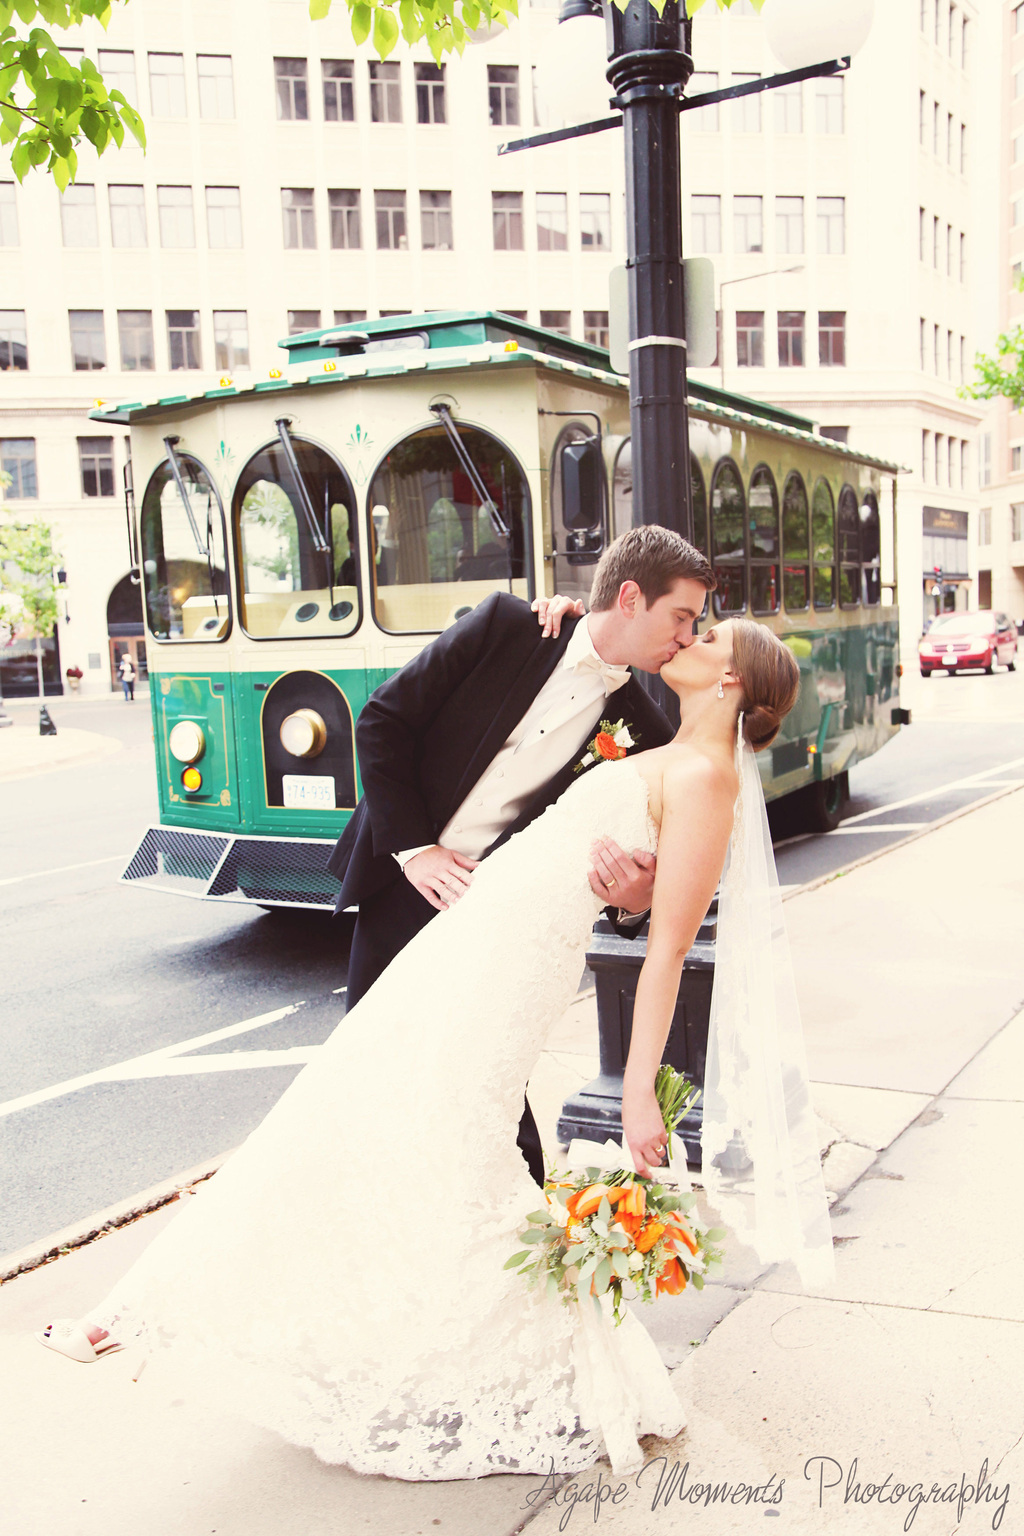 Becca%20britt-wedding%201-0327%20copy.full